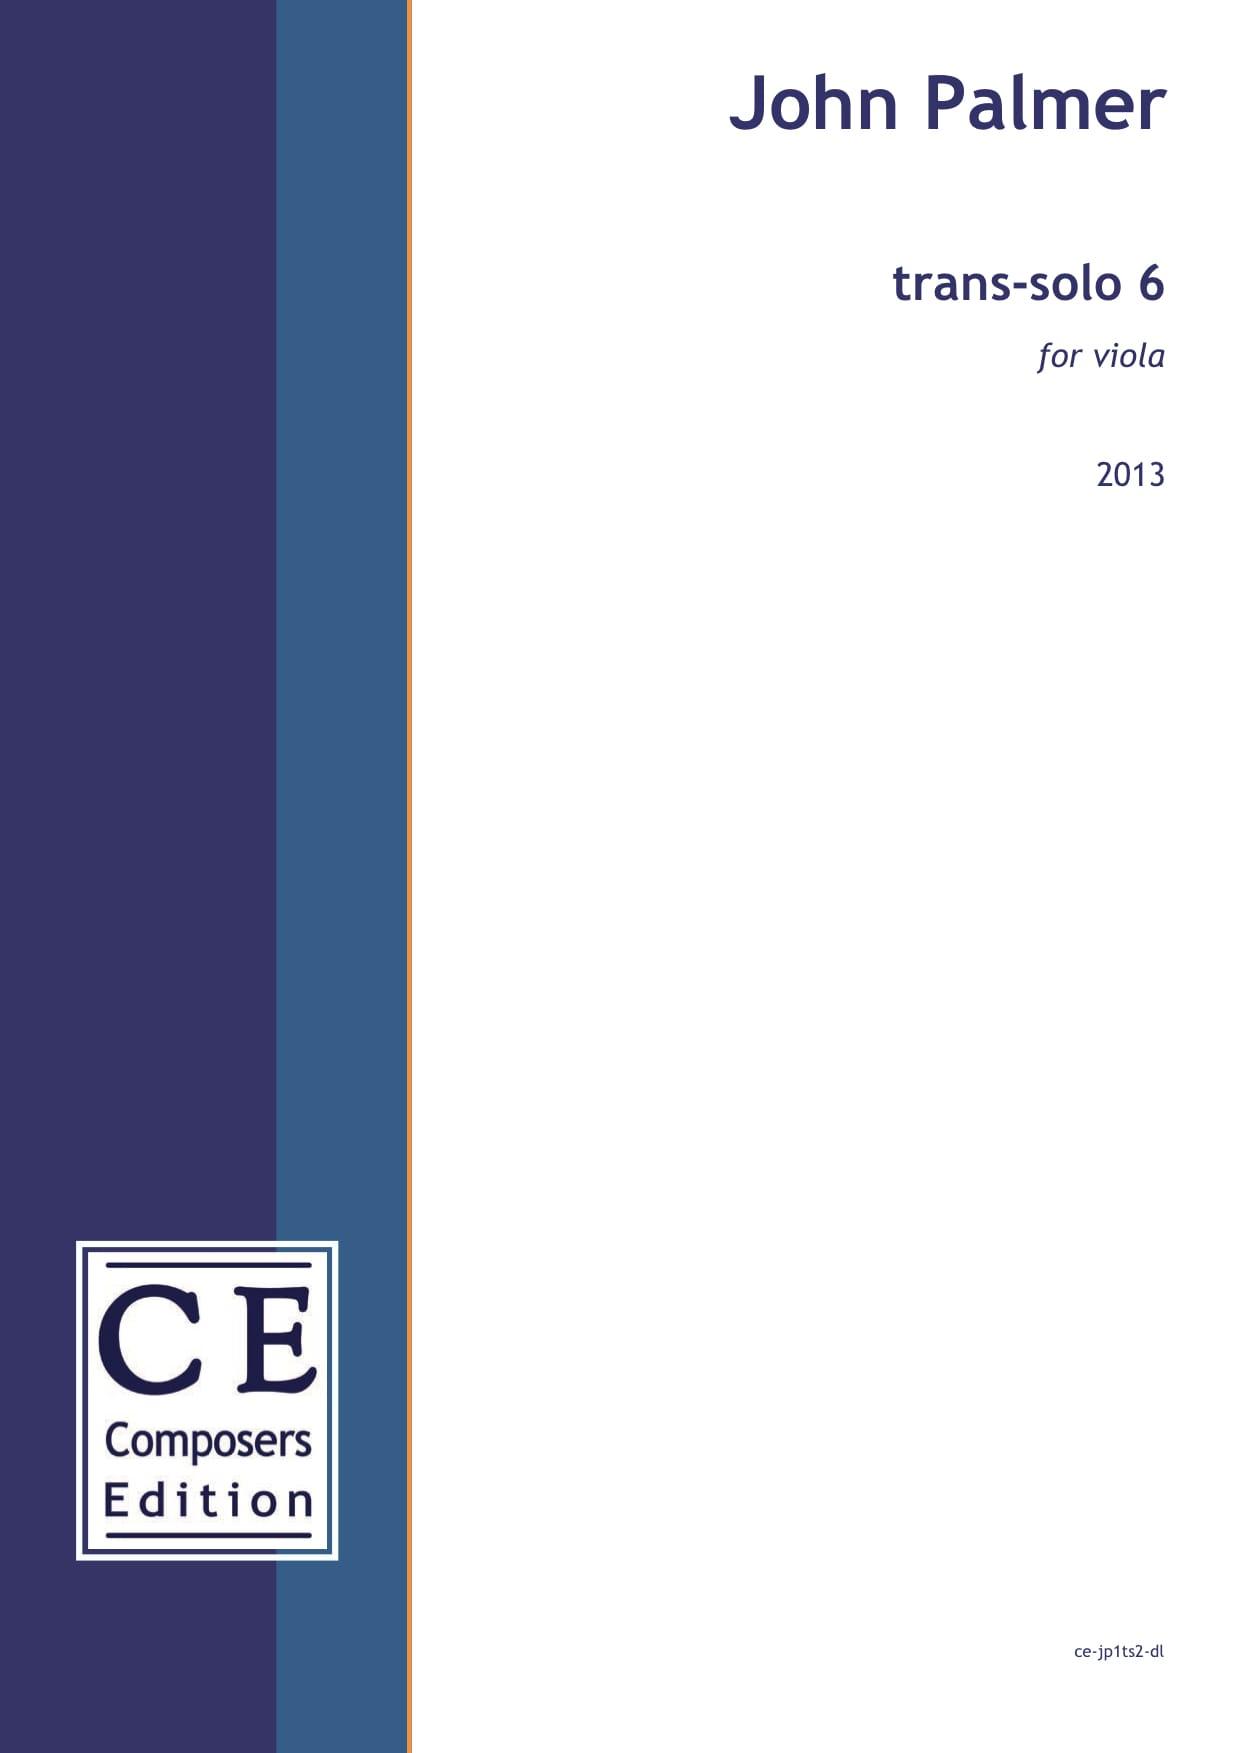 John Palmer: trans-solo 6 for viola